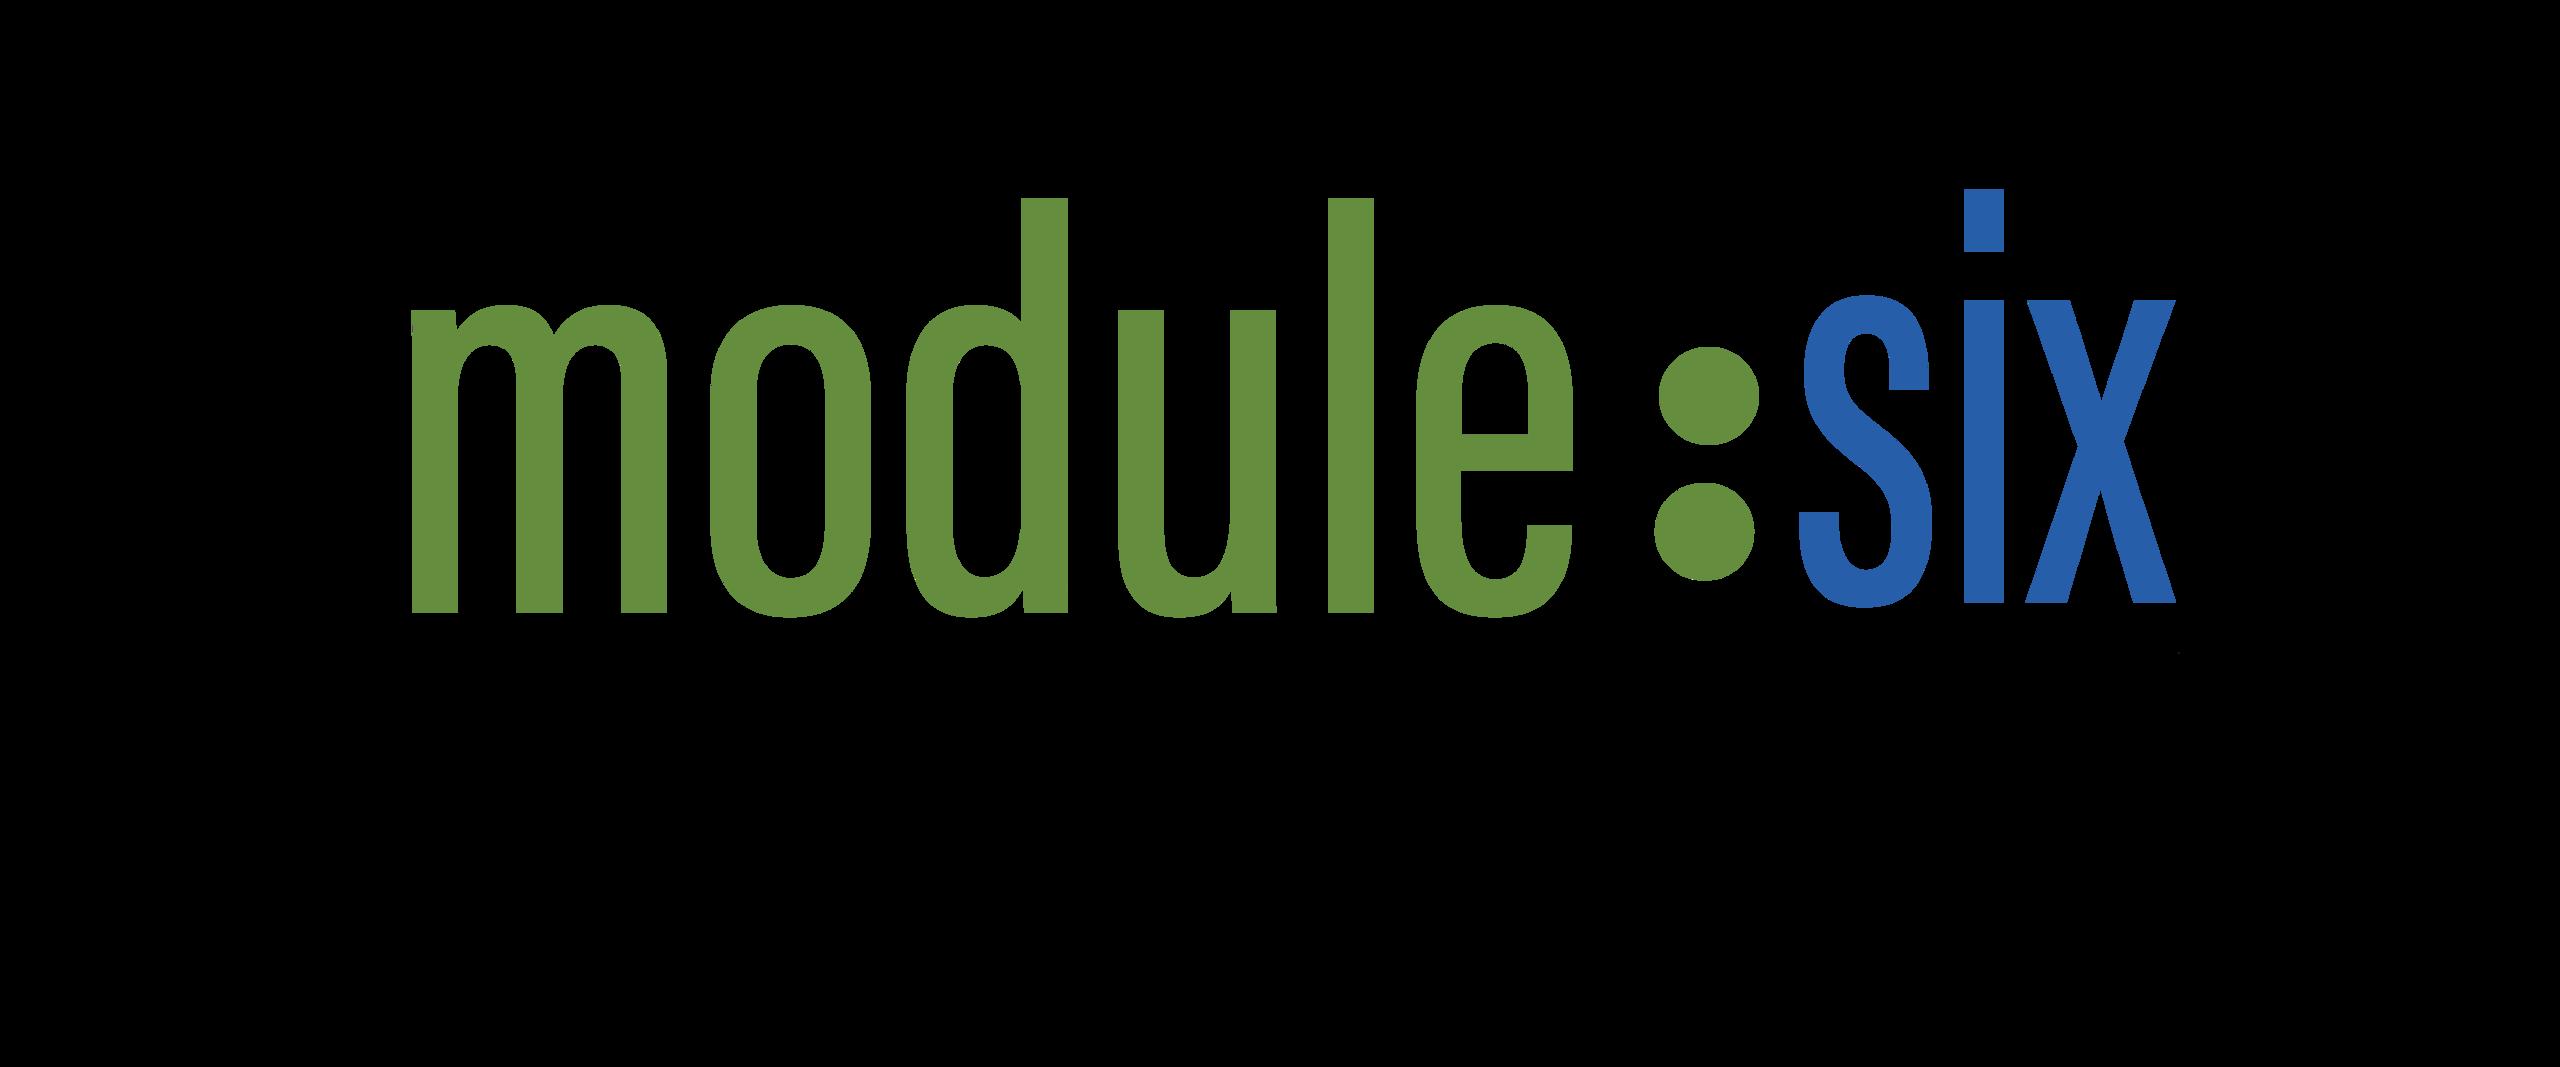 Encore:CEO Module 6